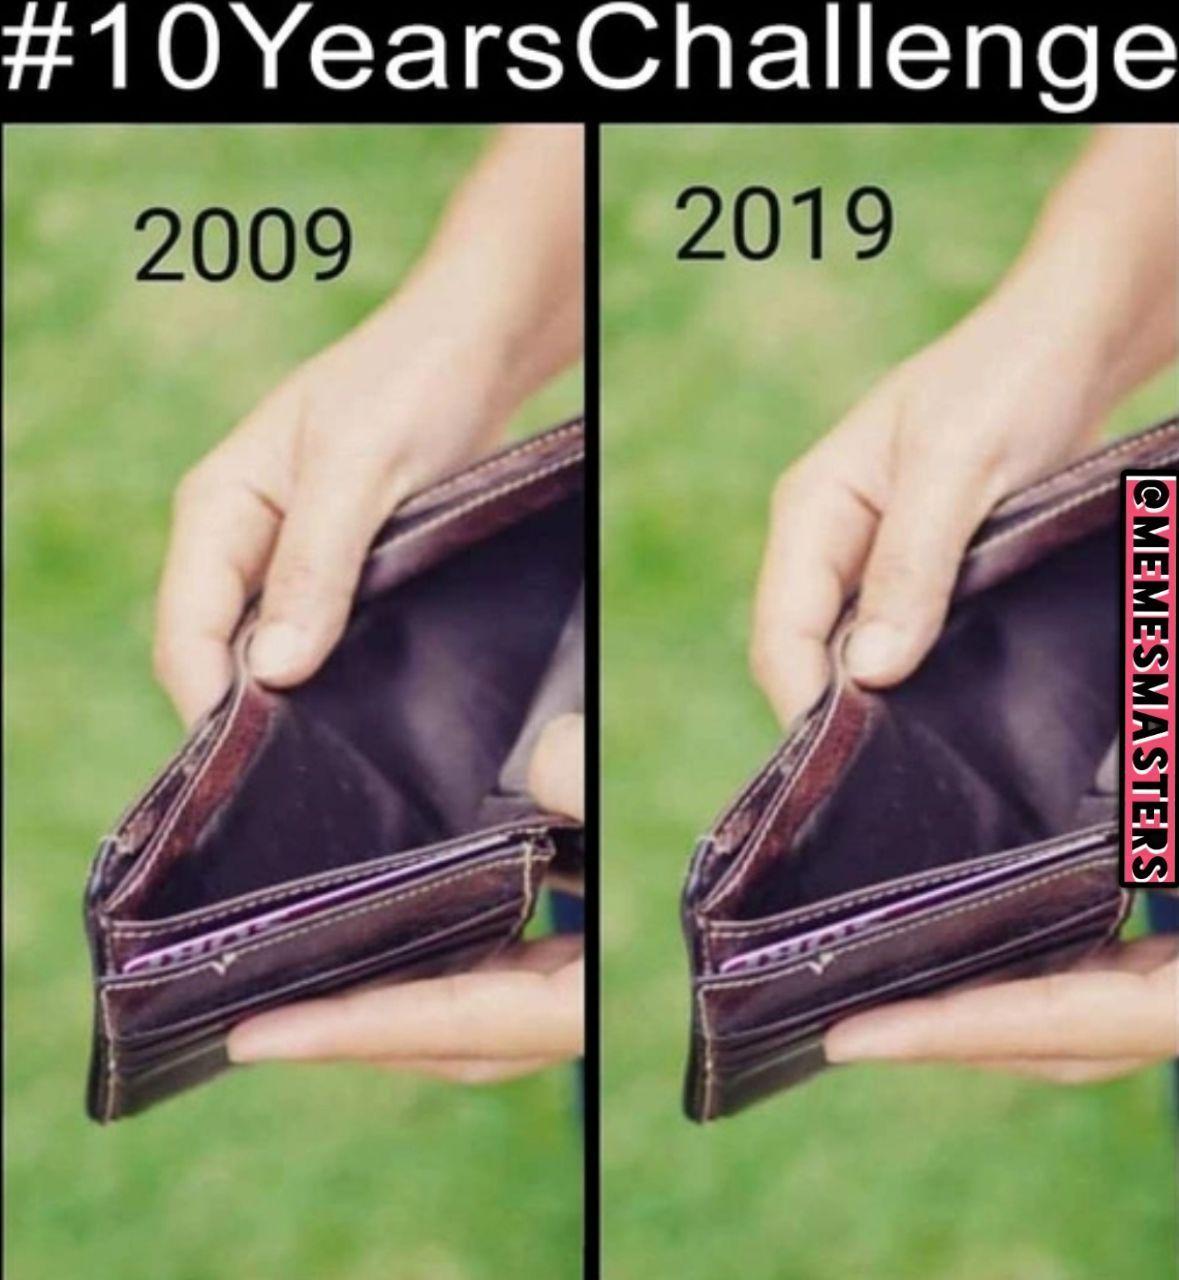 10 years challenge - meme